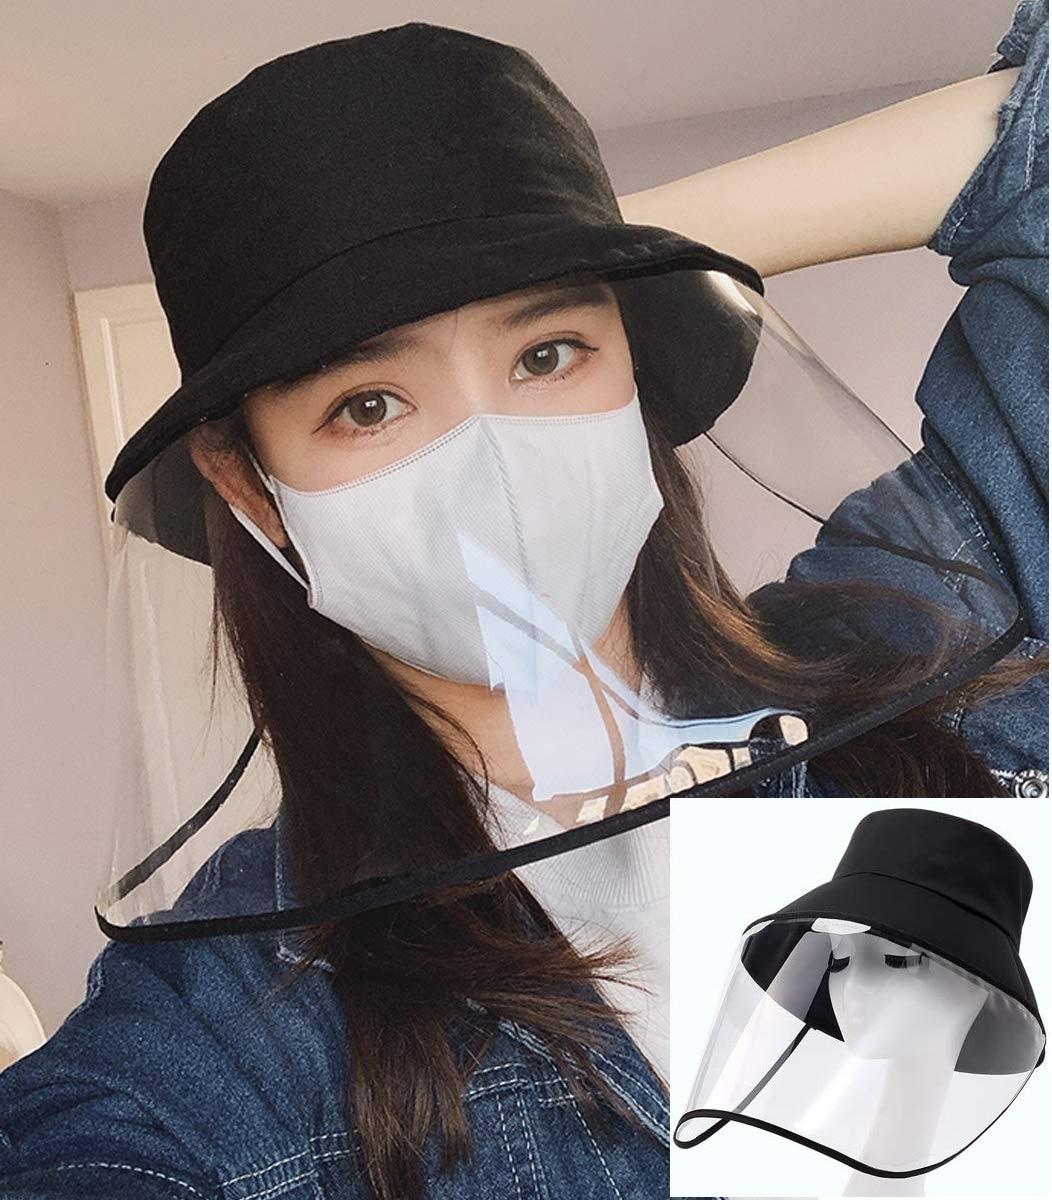 Transparent Mask Hat Protective Particulate Anti-Spitting Splash Windproof Face Shield Prevent Saliva Droplet Removable Mask